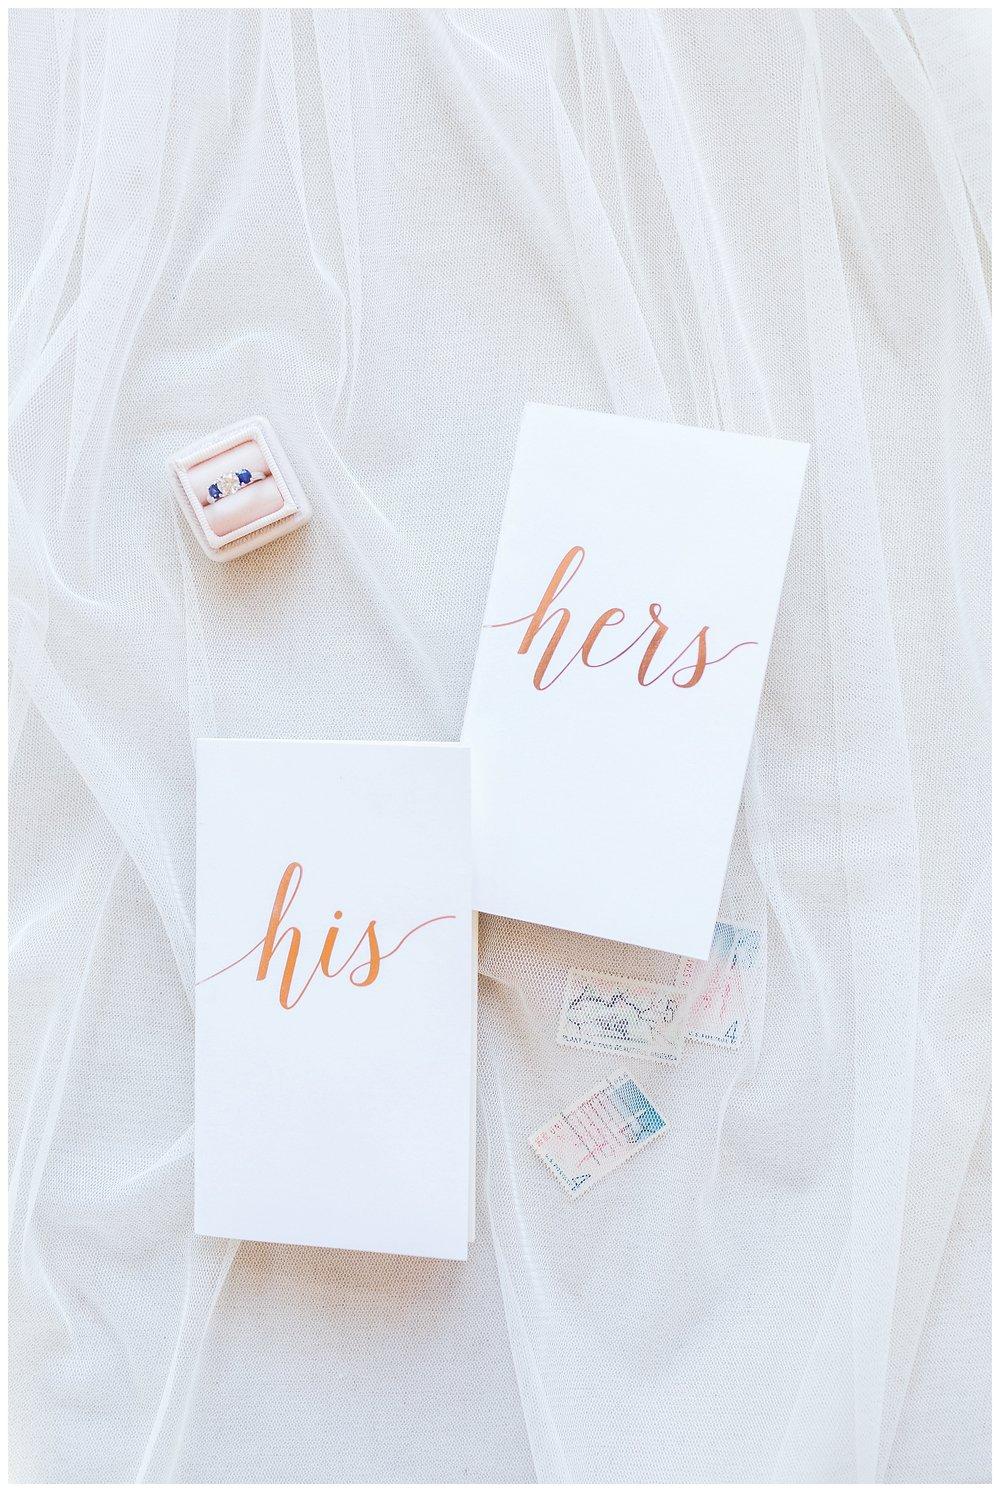 Meridian Hill Park Wedding | Washington DC Wedding Photographer Kir Tuben_0014.jpg